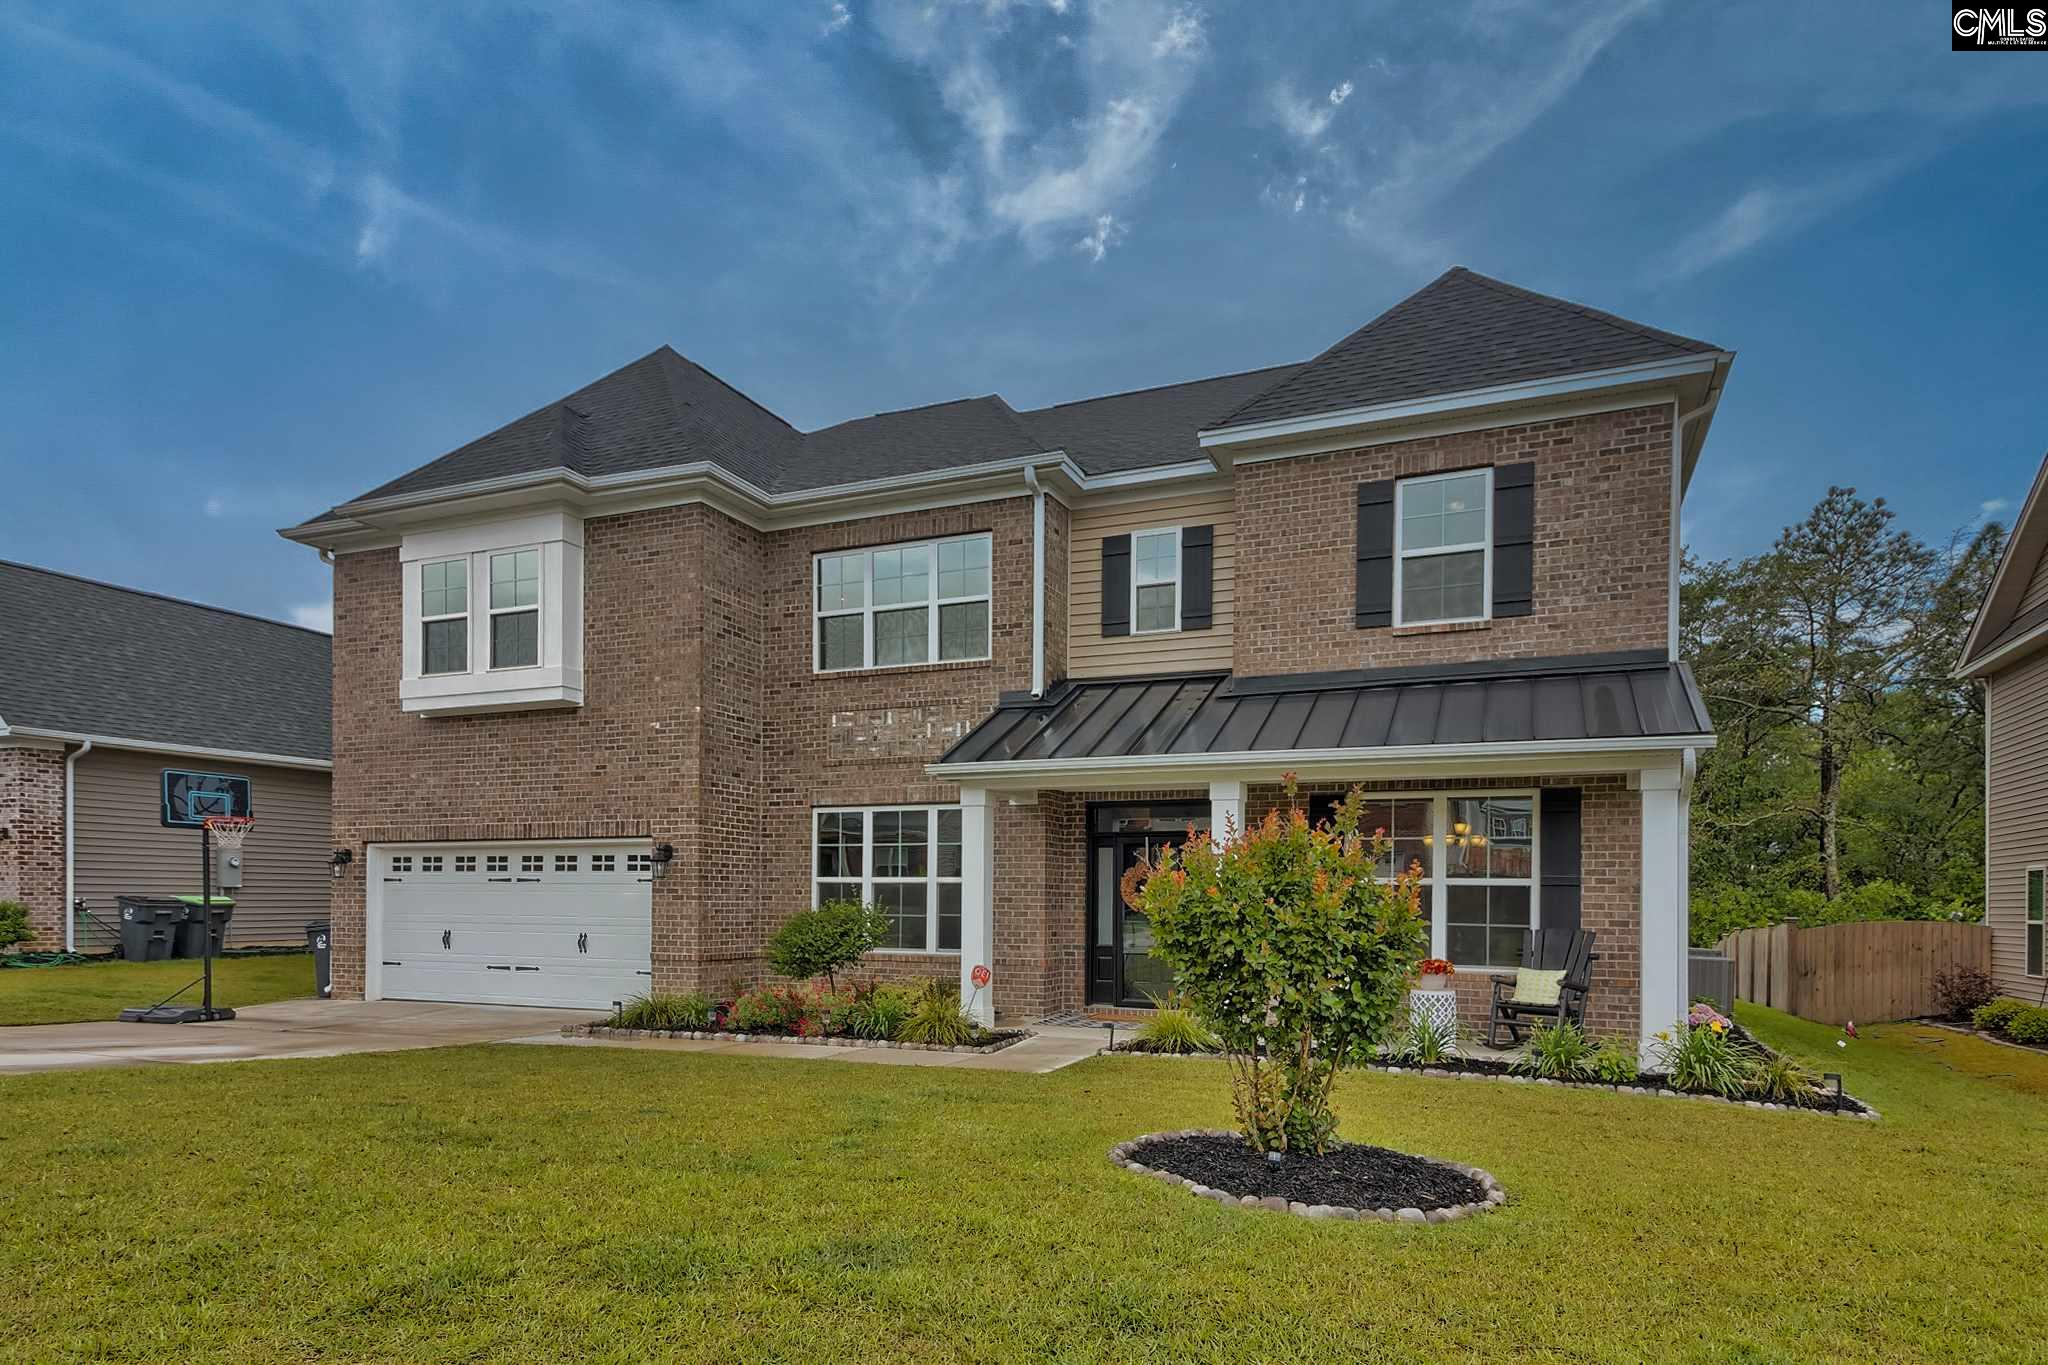 127 Golden Oaks Lexington, SC 29072